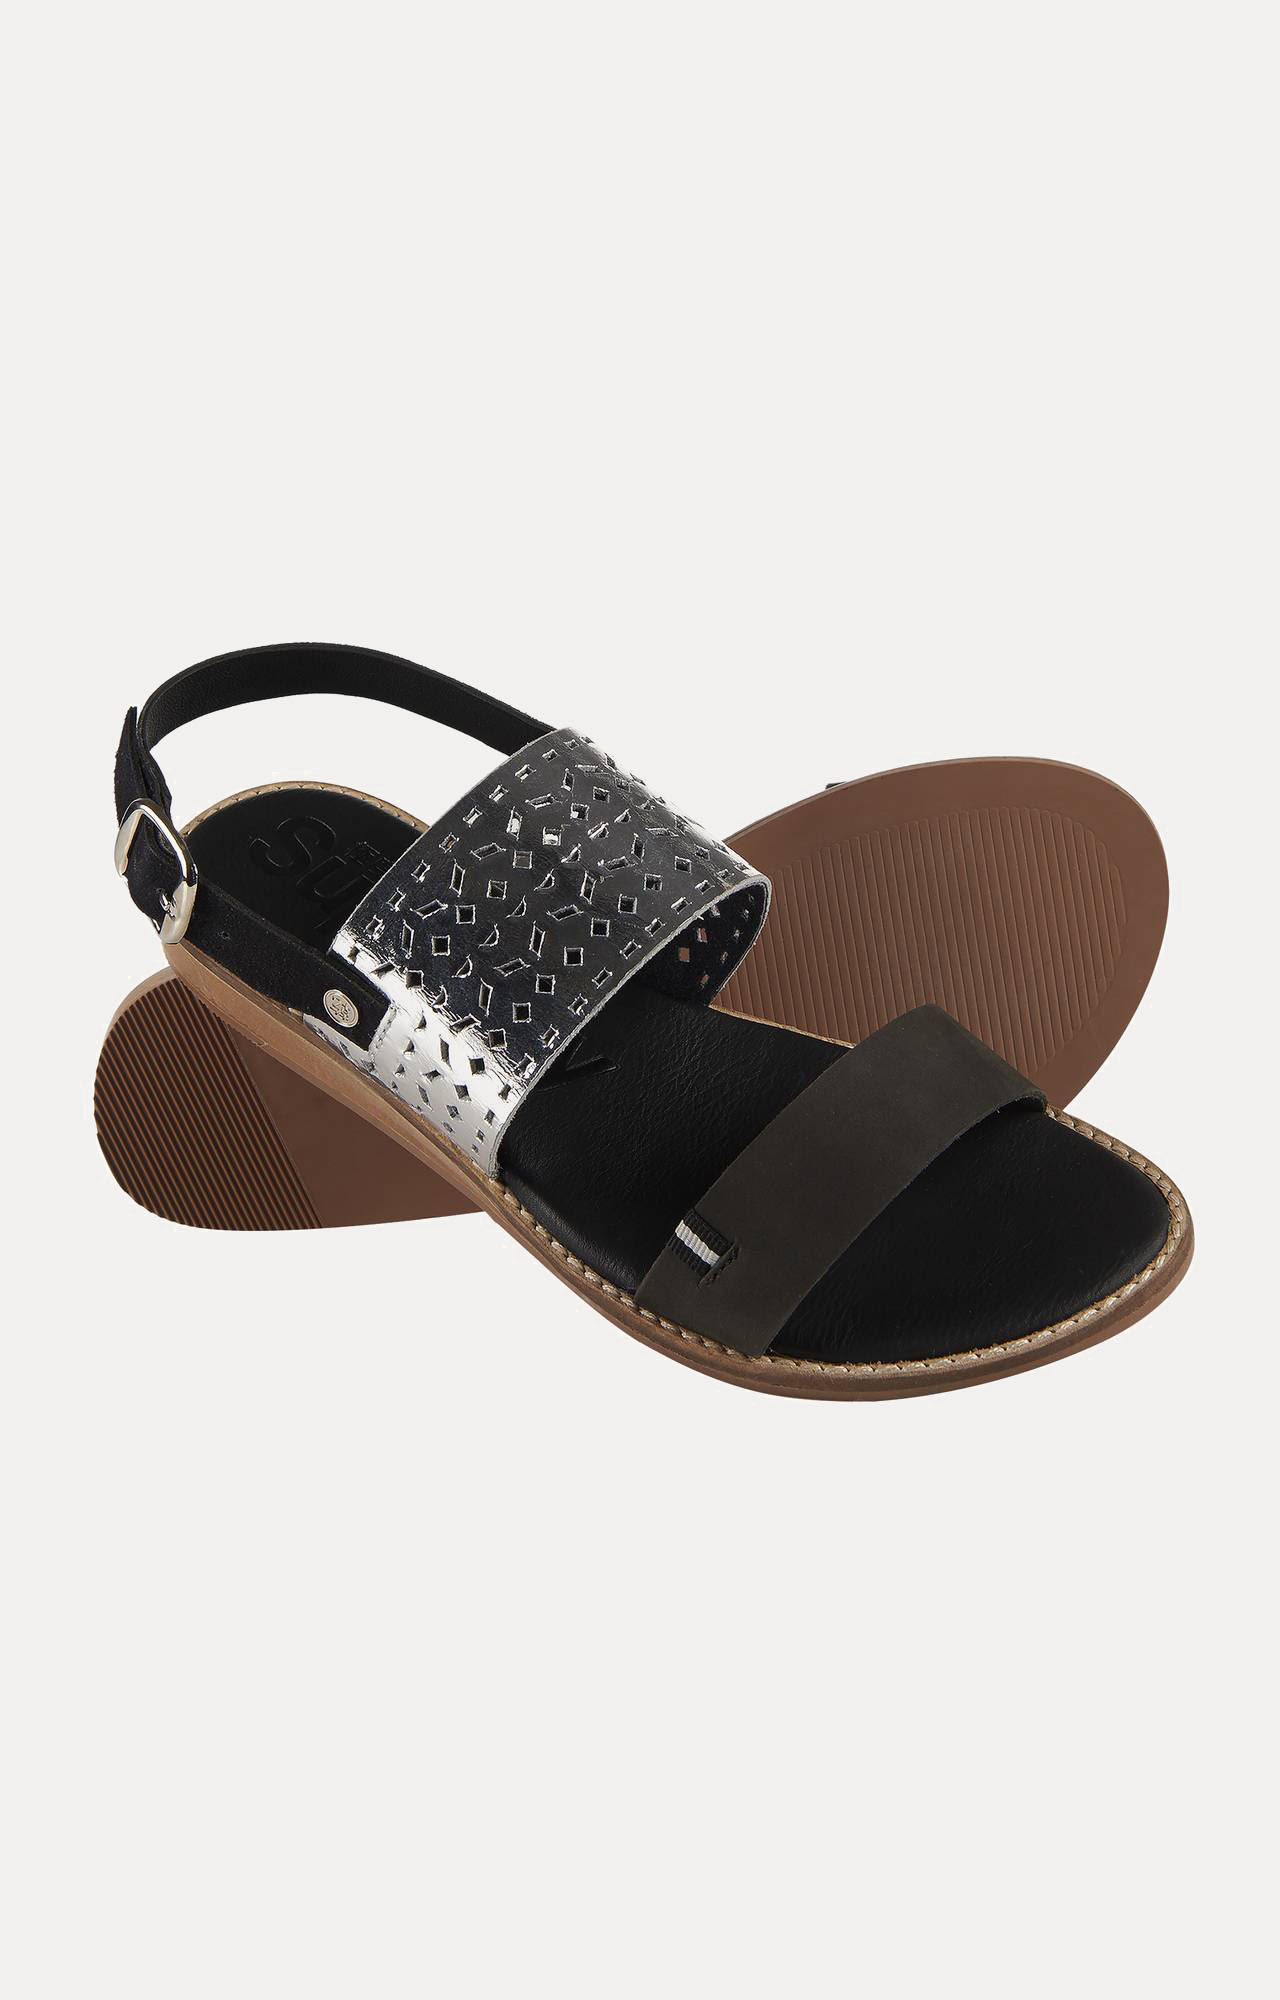 Superdry | Sandbar Double Strap Black Sandals